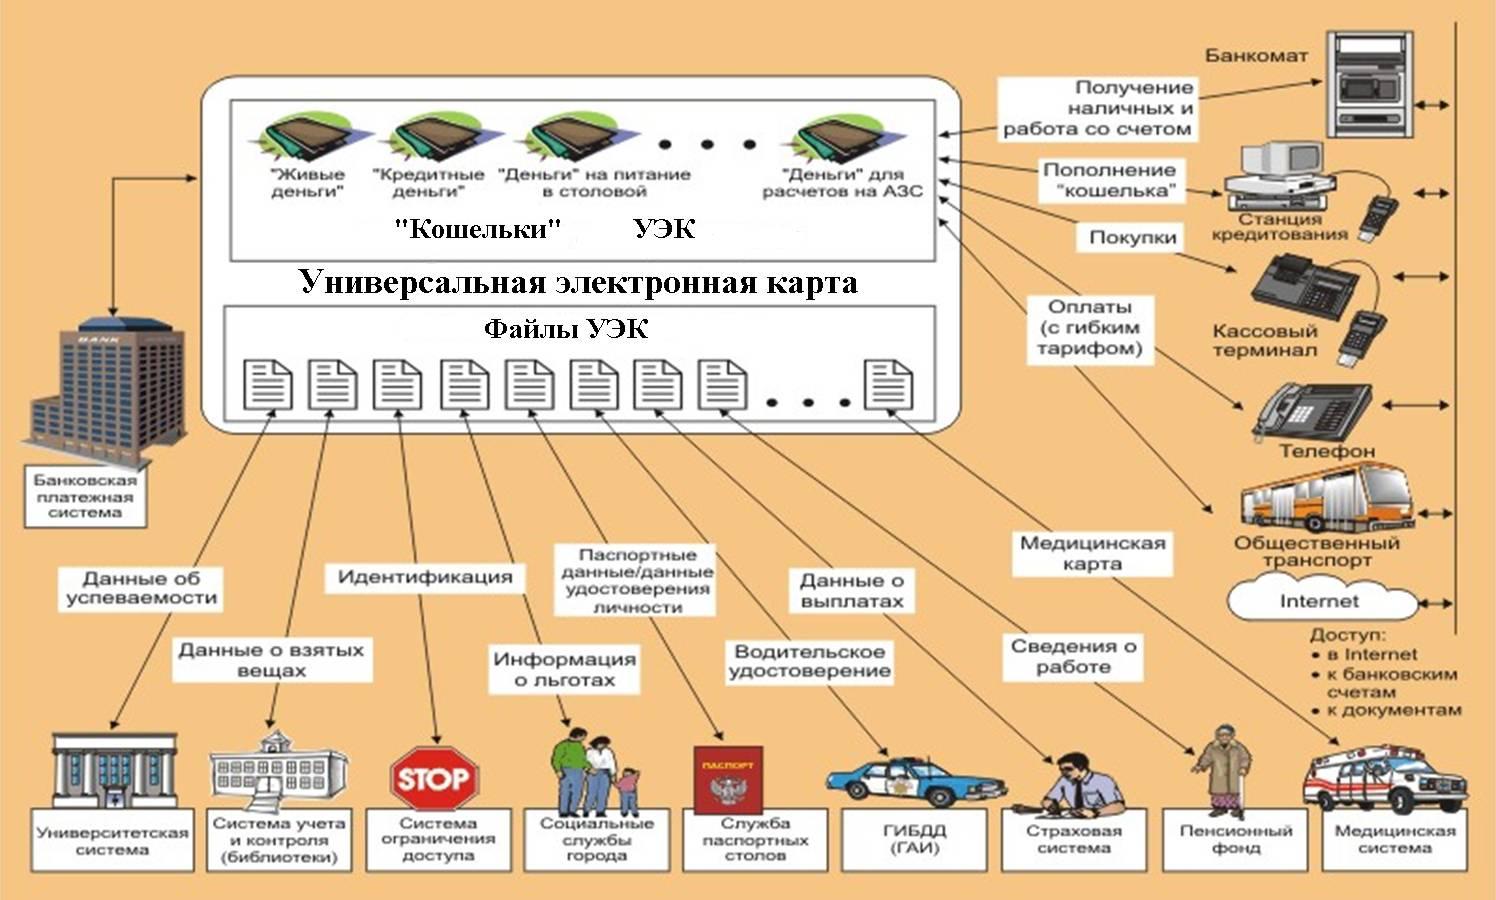 http://protivkart.org/uploads/posts/2011-08/1313060244_shema-uek-umensh.jpg